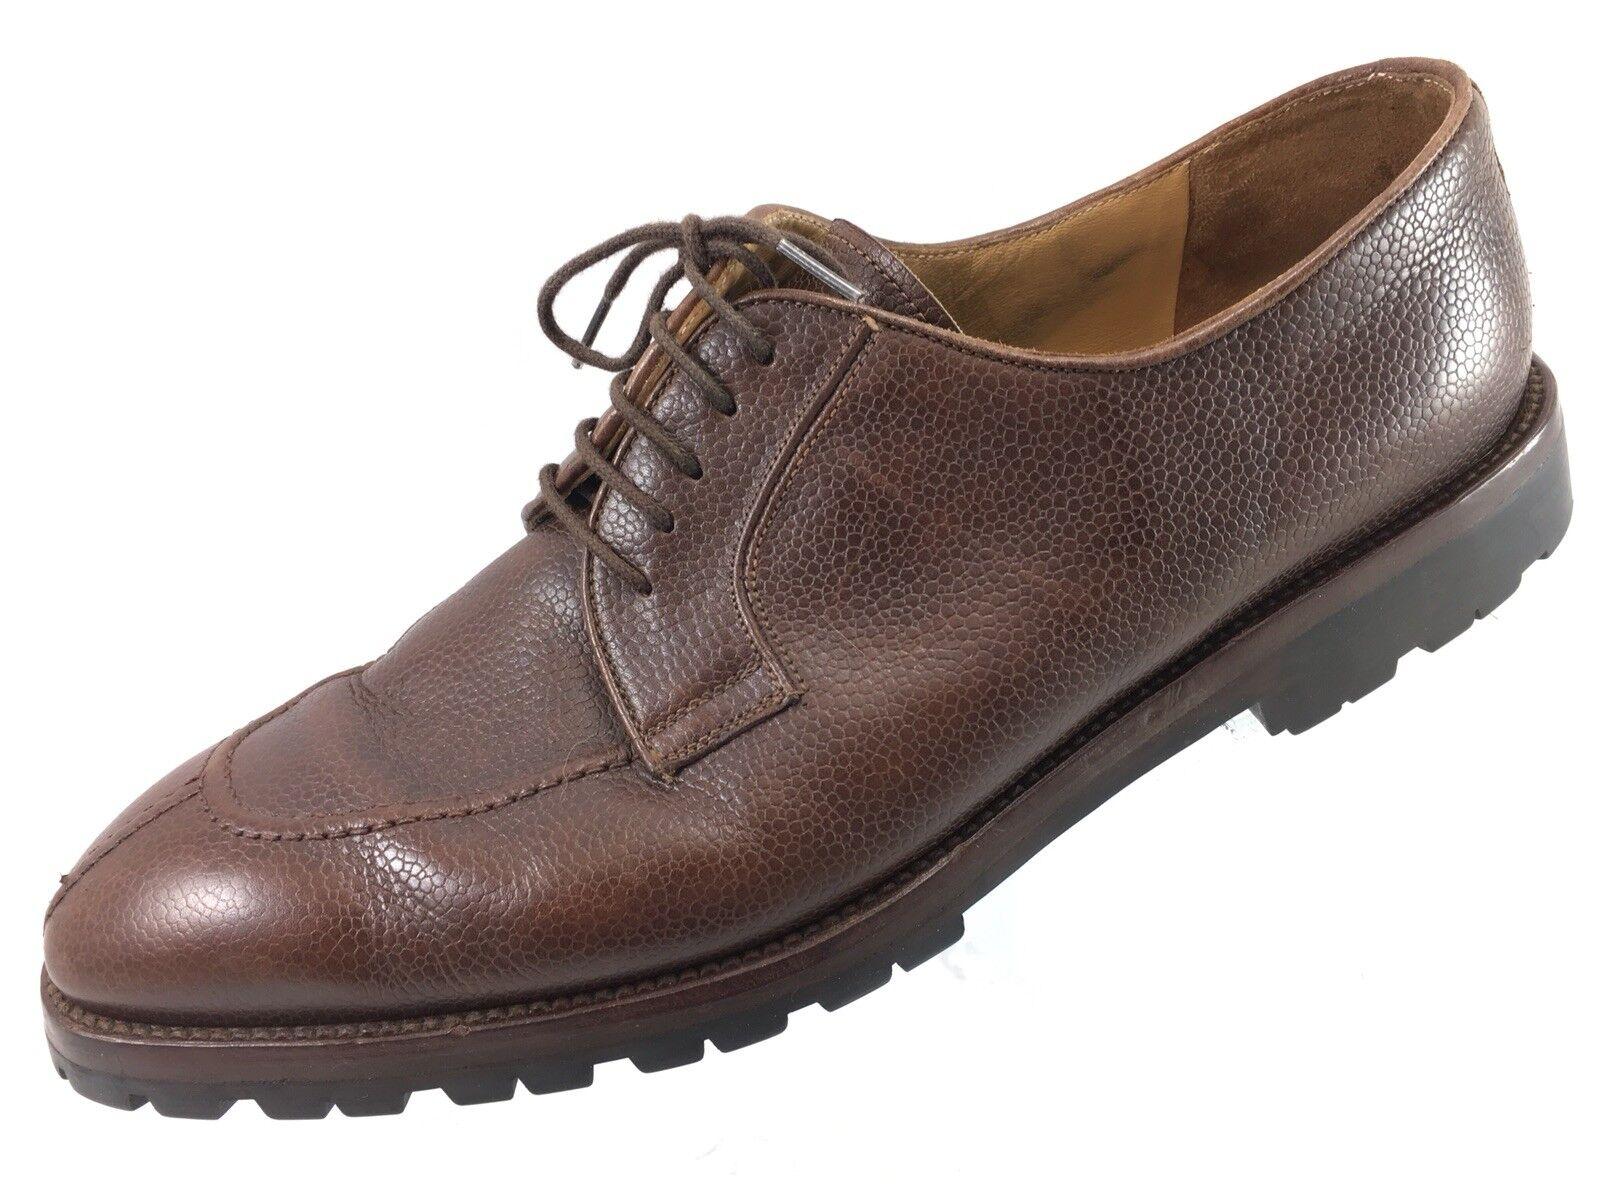 SH26 York Barneys New York SH26 Sz 12 Brown Pebbled Leather Split Toe Oxford Shoes Italy Scarpe classiche da uomo 8e38d8